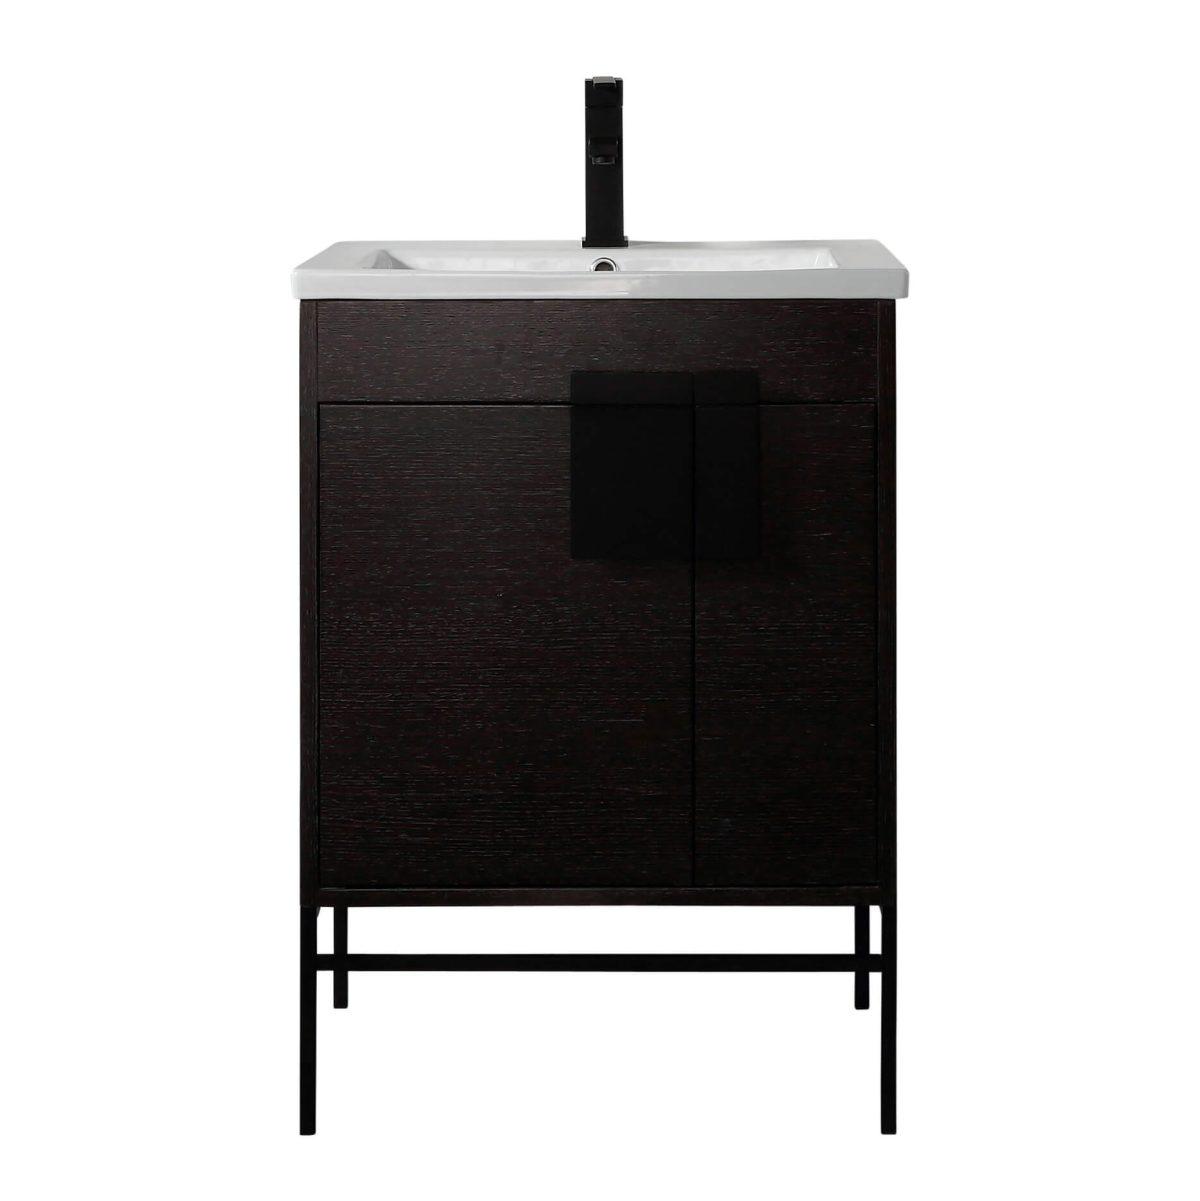 "Shawbridge 24"" Modern Bathroom Vanity  Black Oak Straight Grain with Black Hardware"